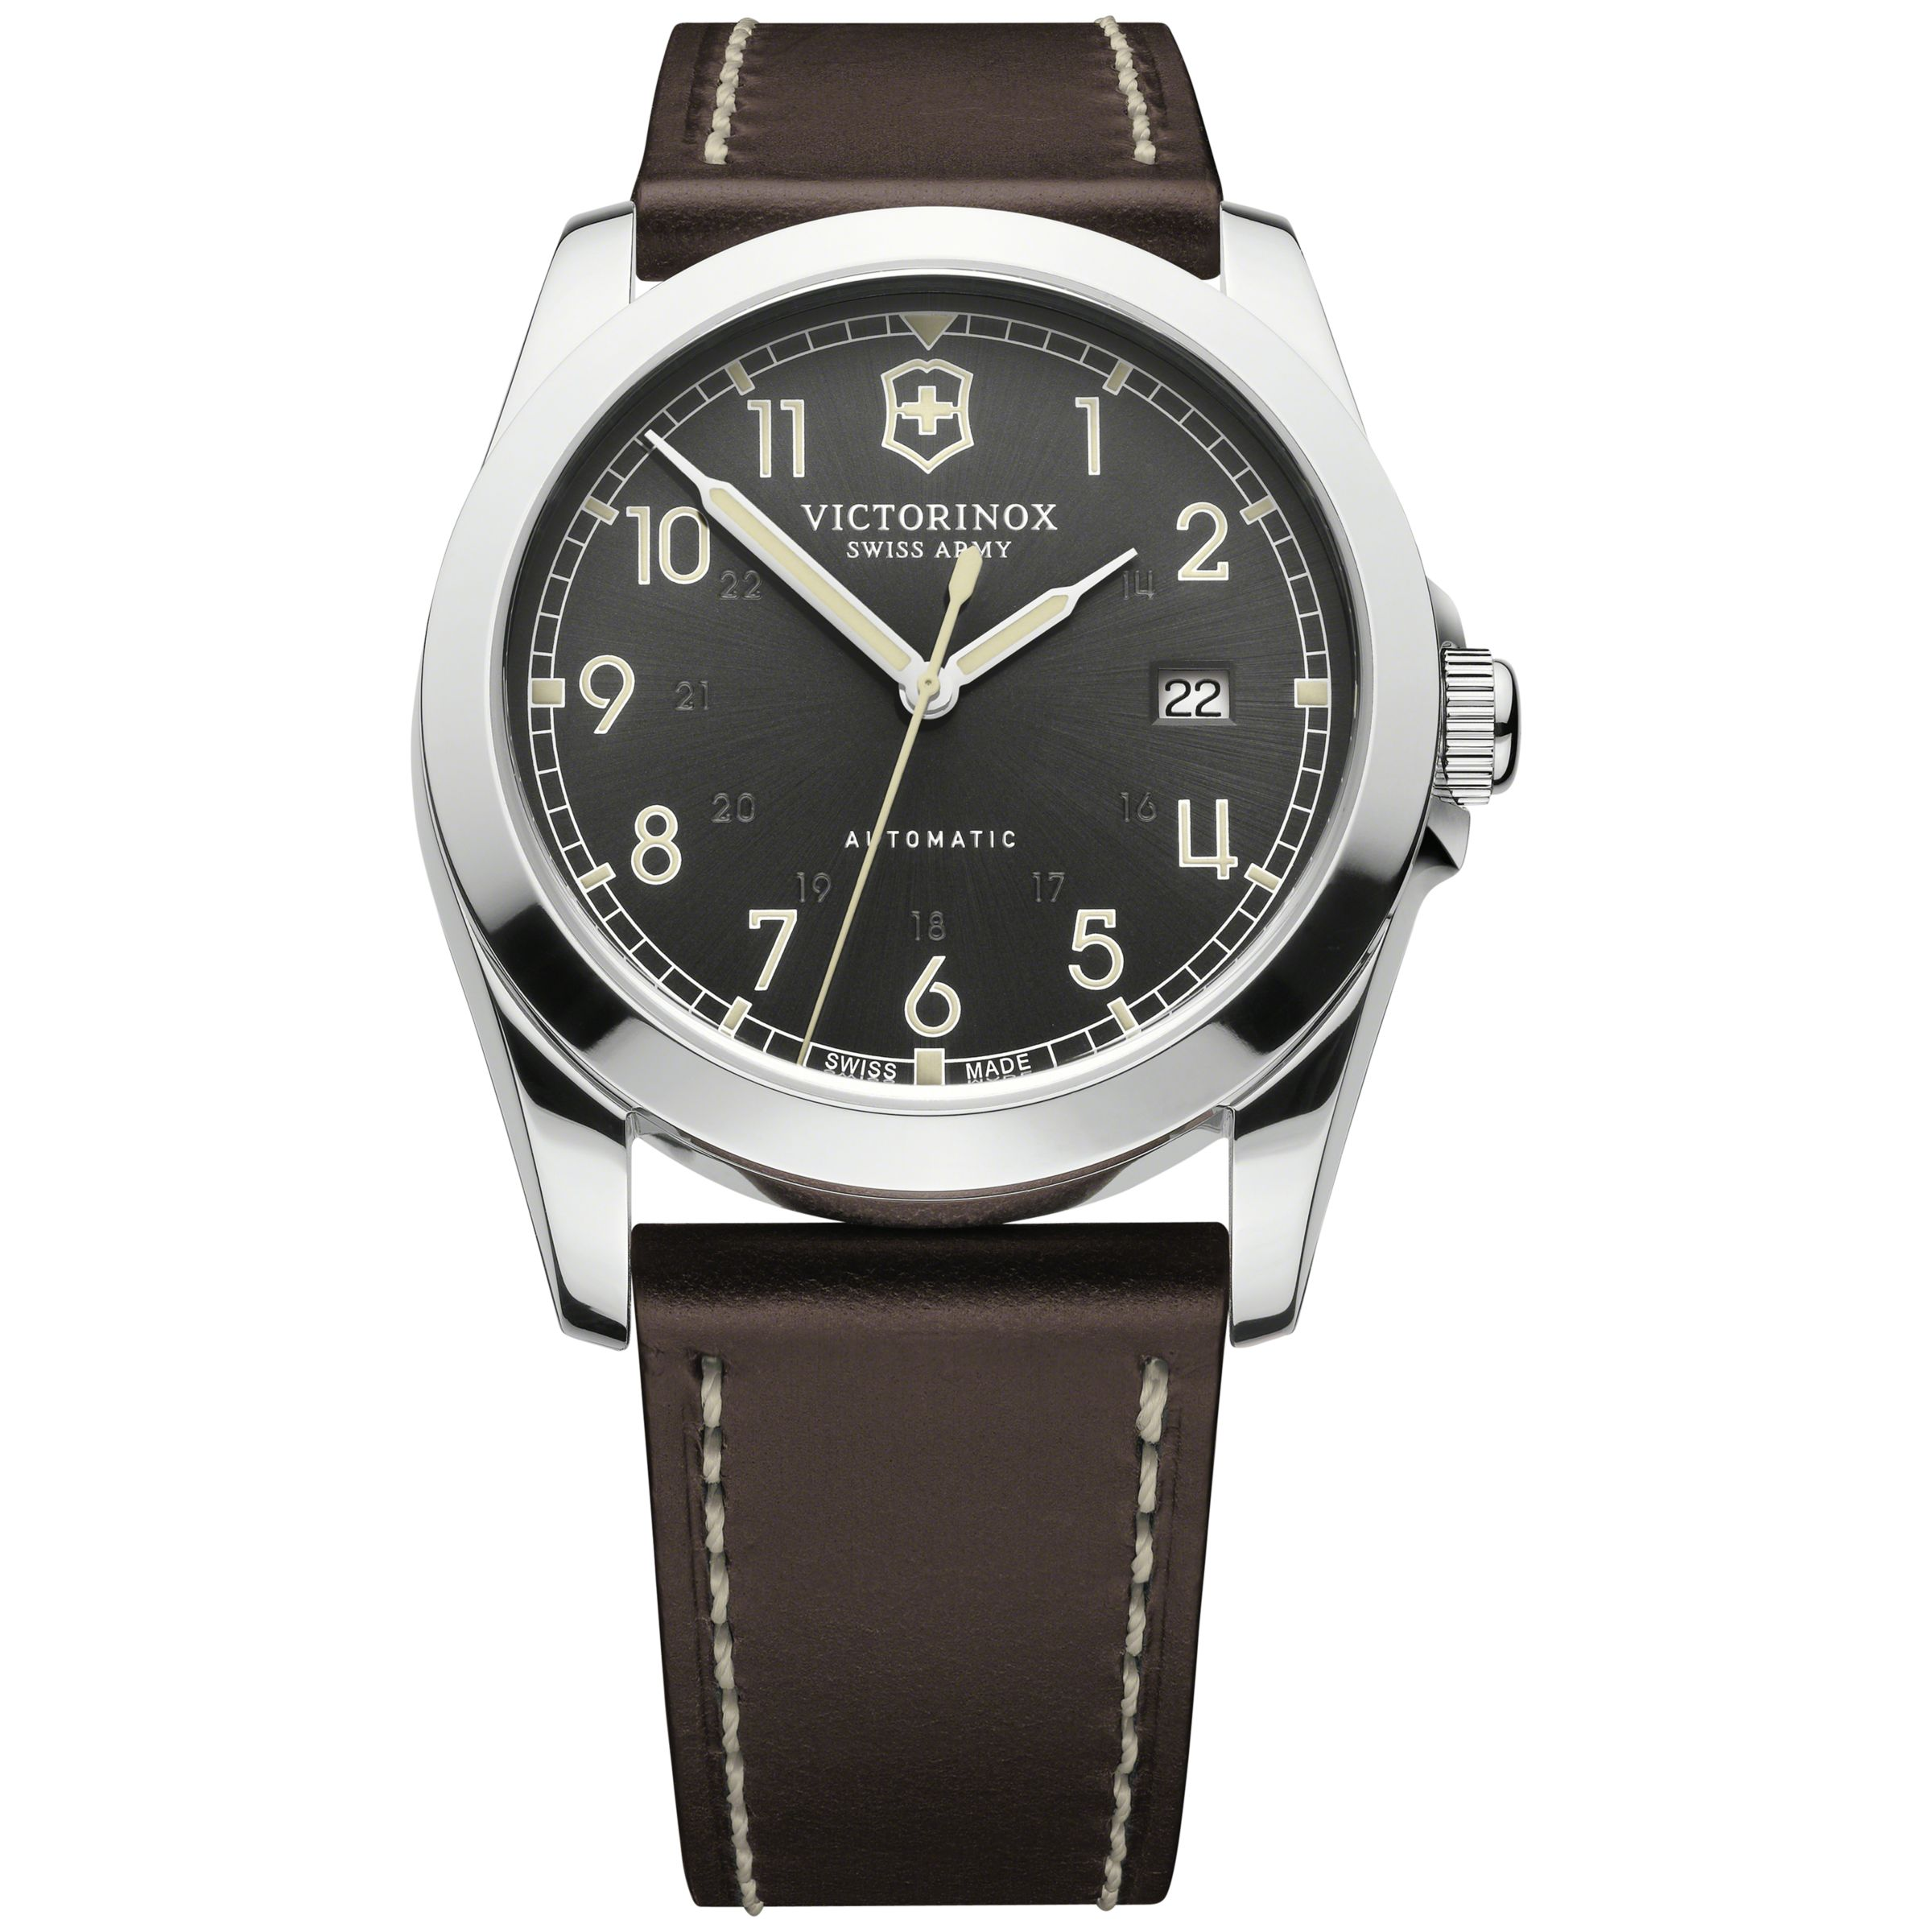 Victorinox Victorinox 241565 Men's Infantry Vintage Leather Strap Watch, Brown/Black